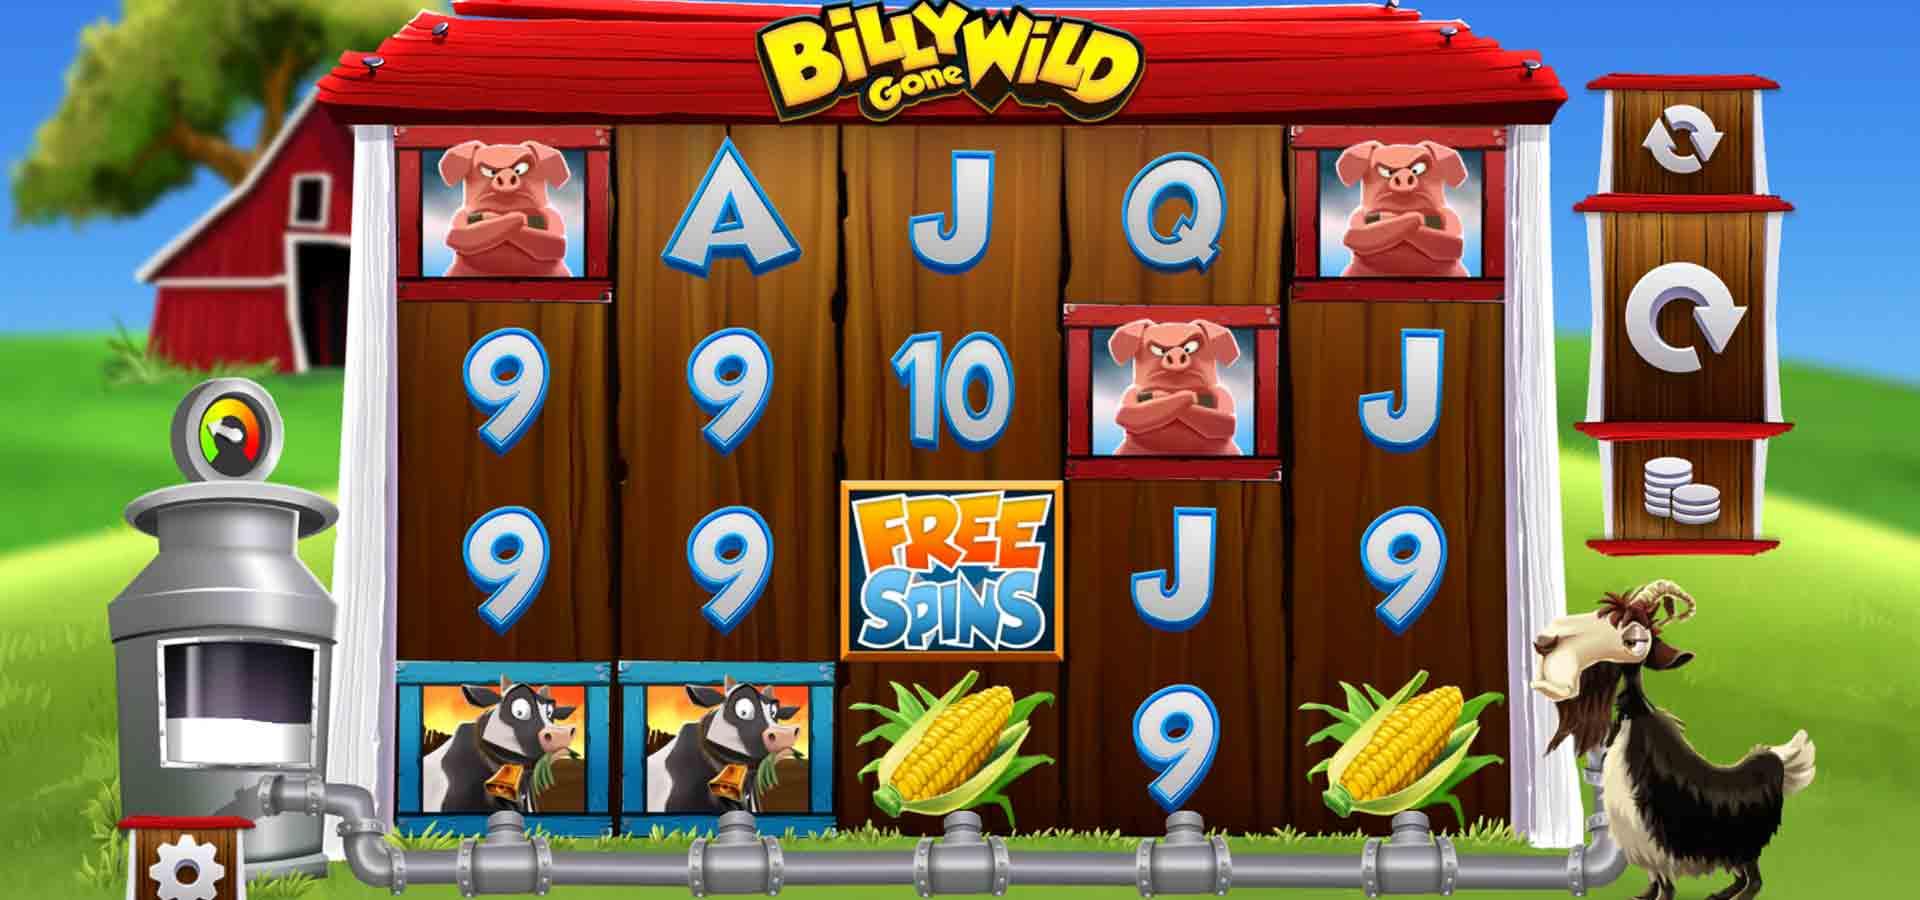 Billy Gone Wild Slot Game